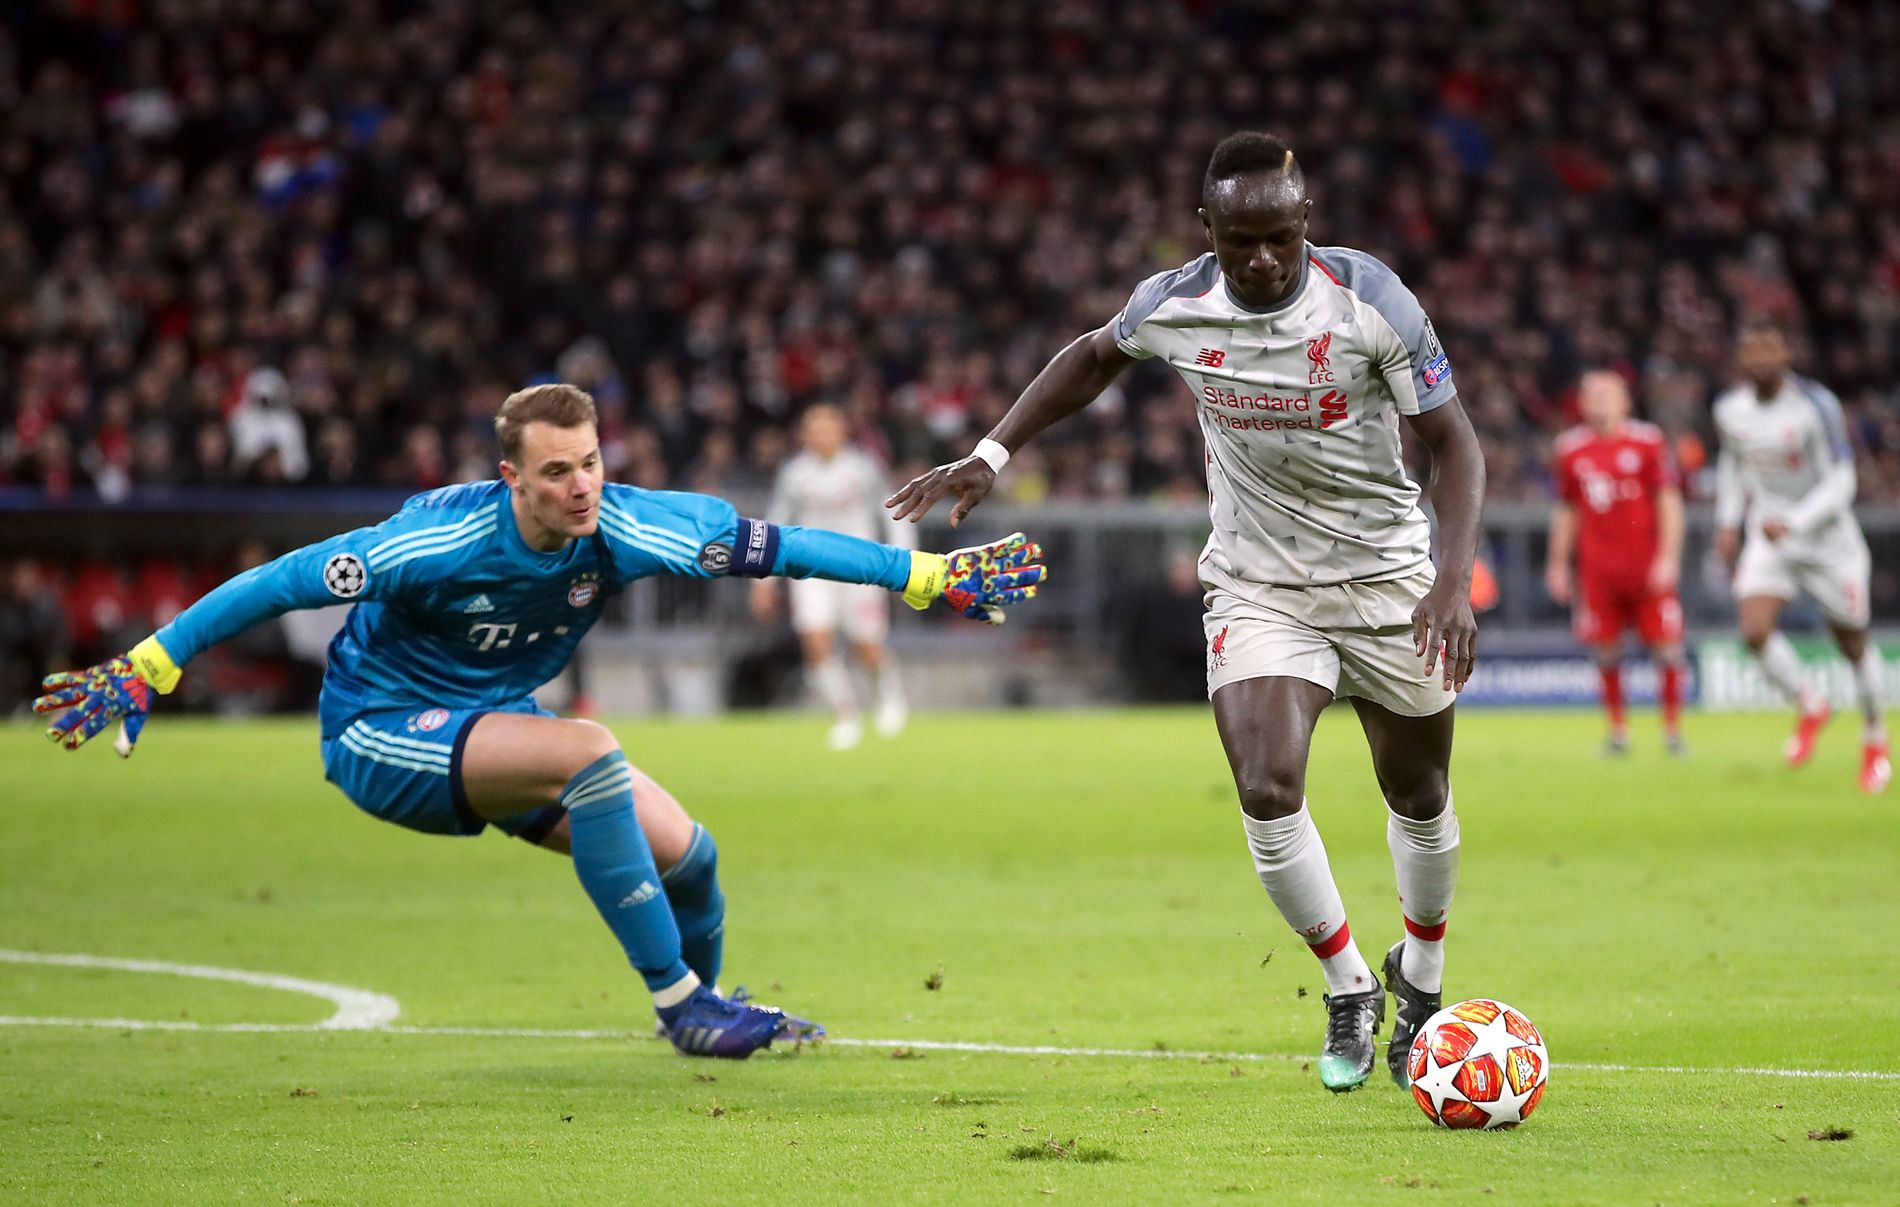 PÅ BÆRTUR: Manuel Neuer angrer nok på at han gikk ut her. Sadio Mané sender Liverpool foran.